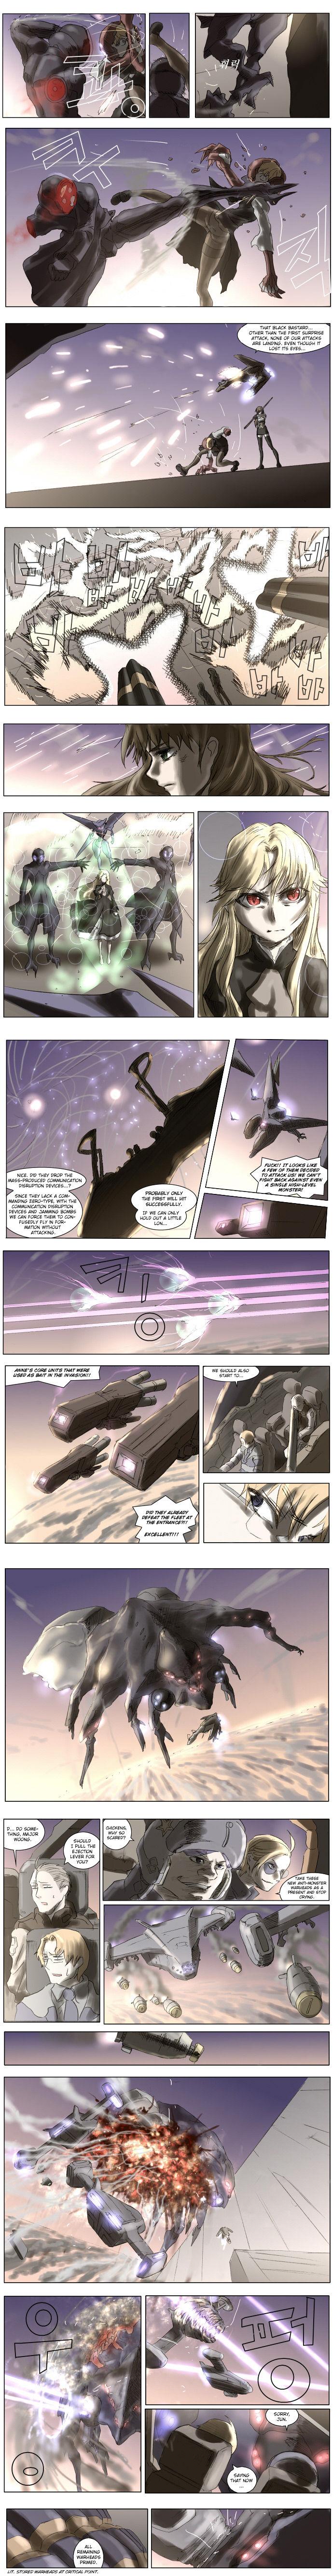 Knight Run 71 Page 3